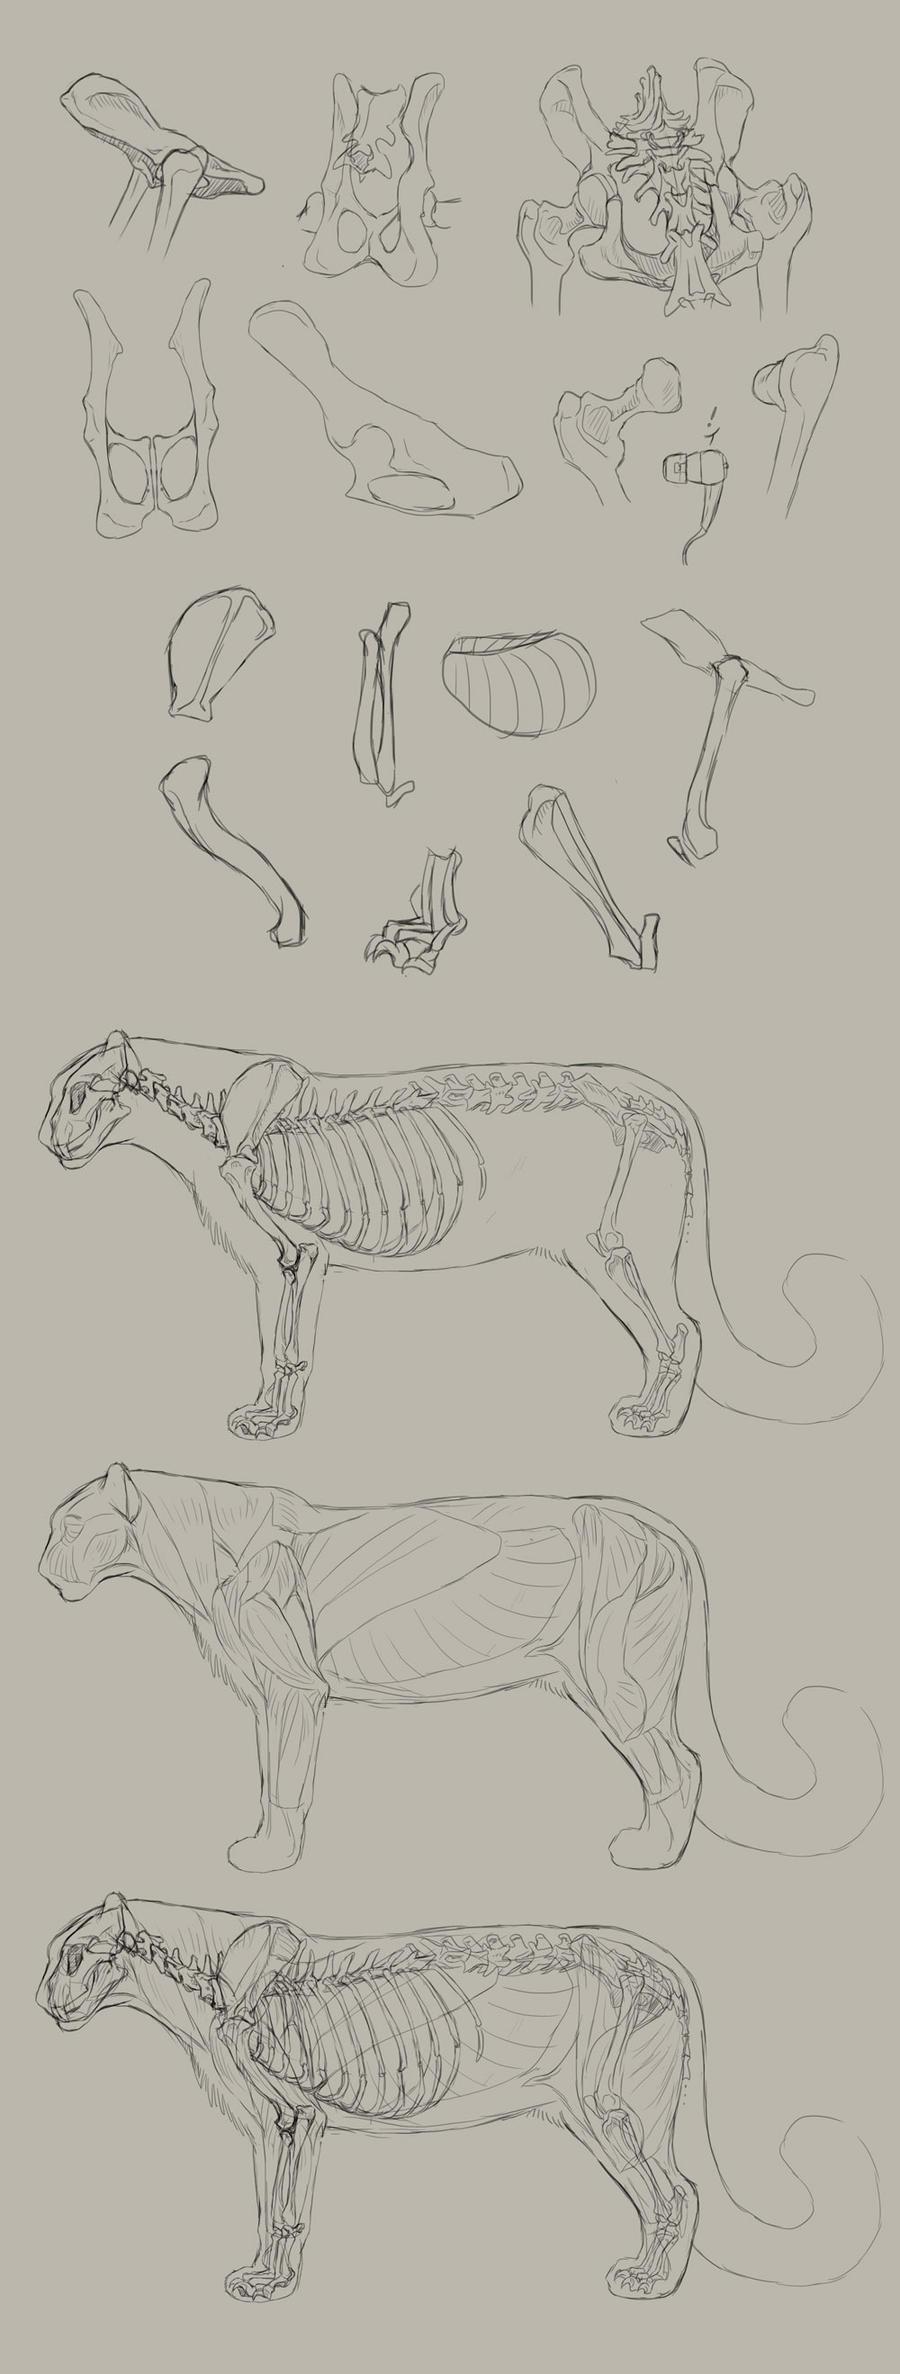 Anatomy Practice Dump #1 by DeyVarah